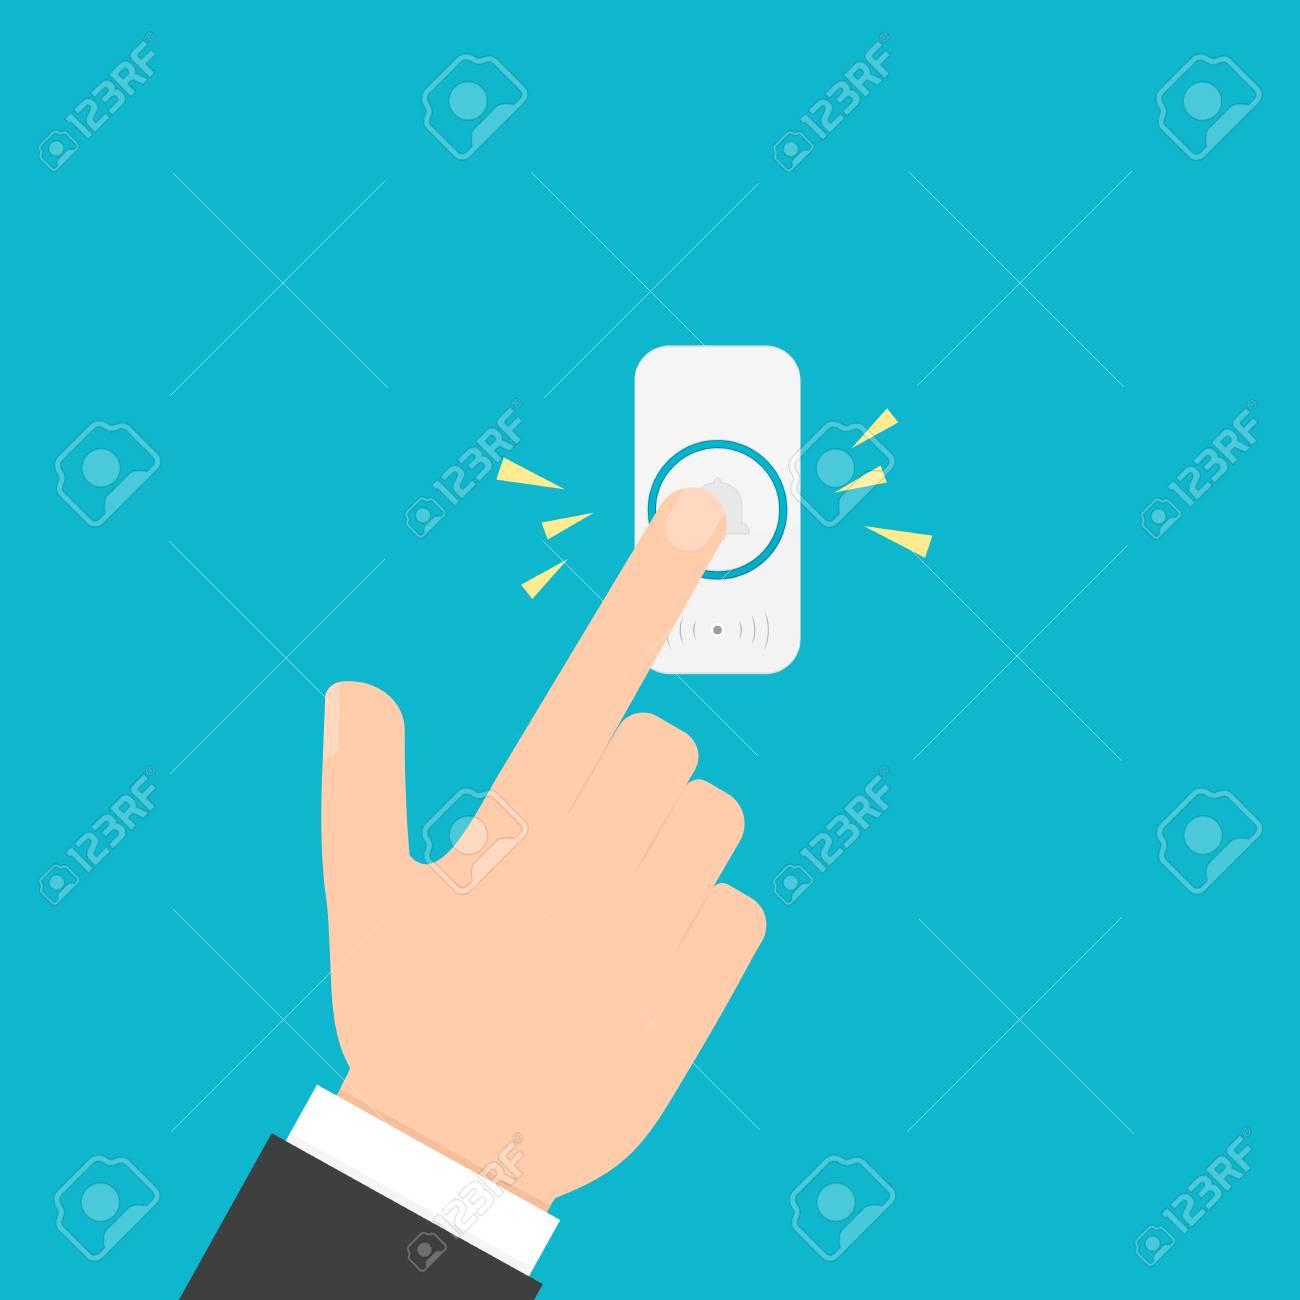 Hand pressing doorbell button - 100720149